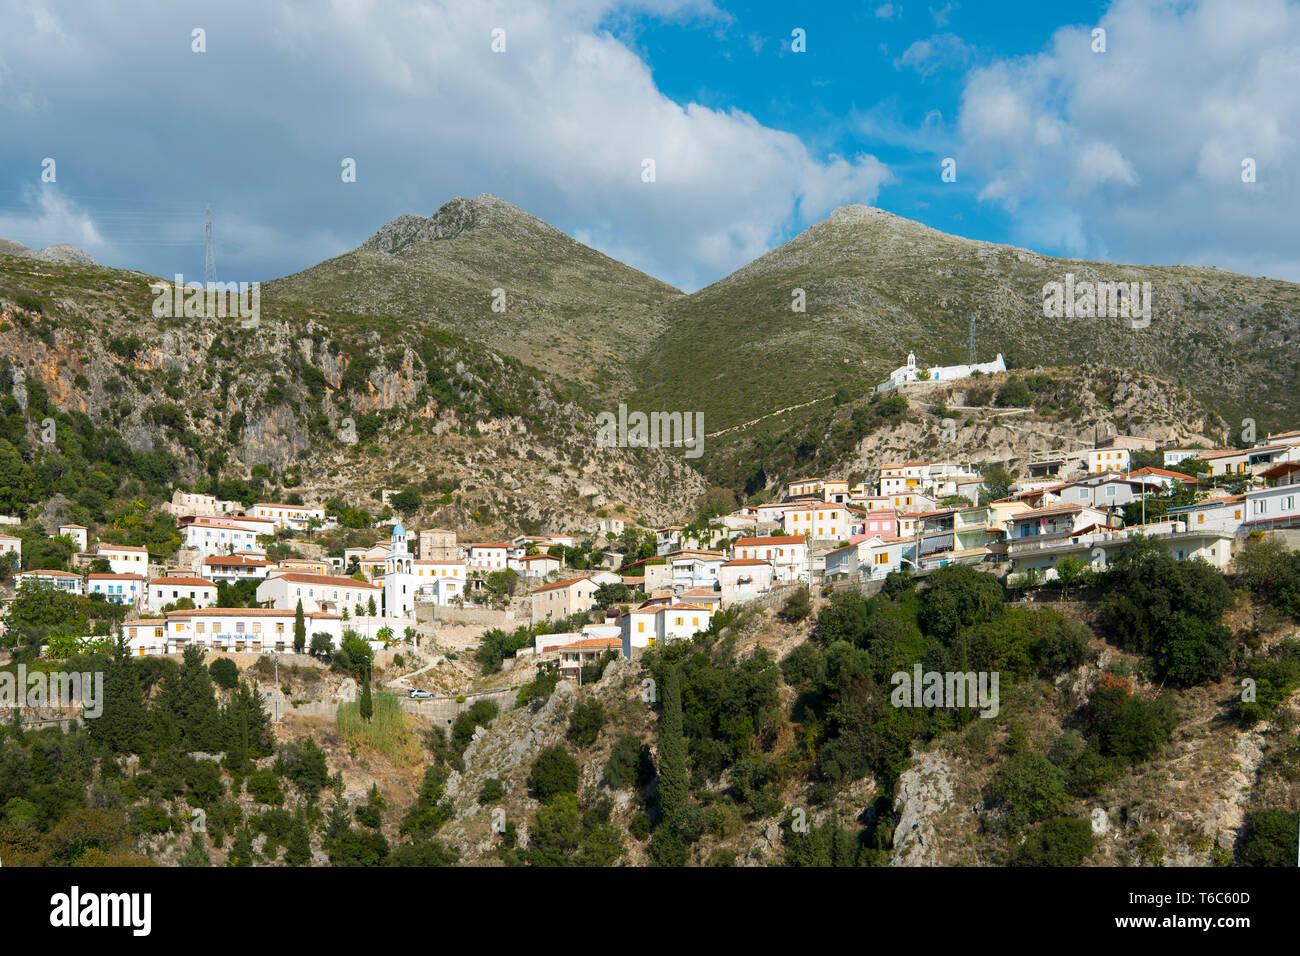 Albanien, Dorf Palase bei Dhermi - Stock Image